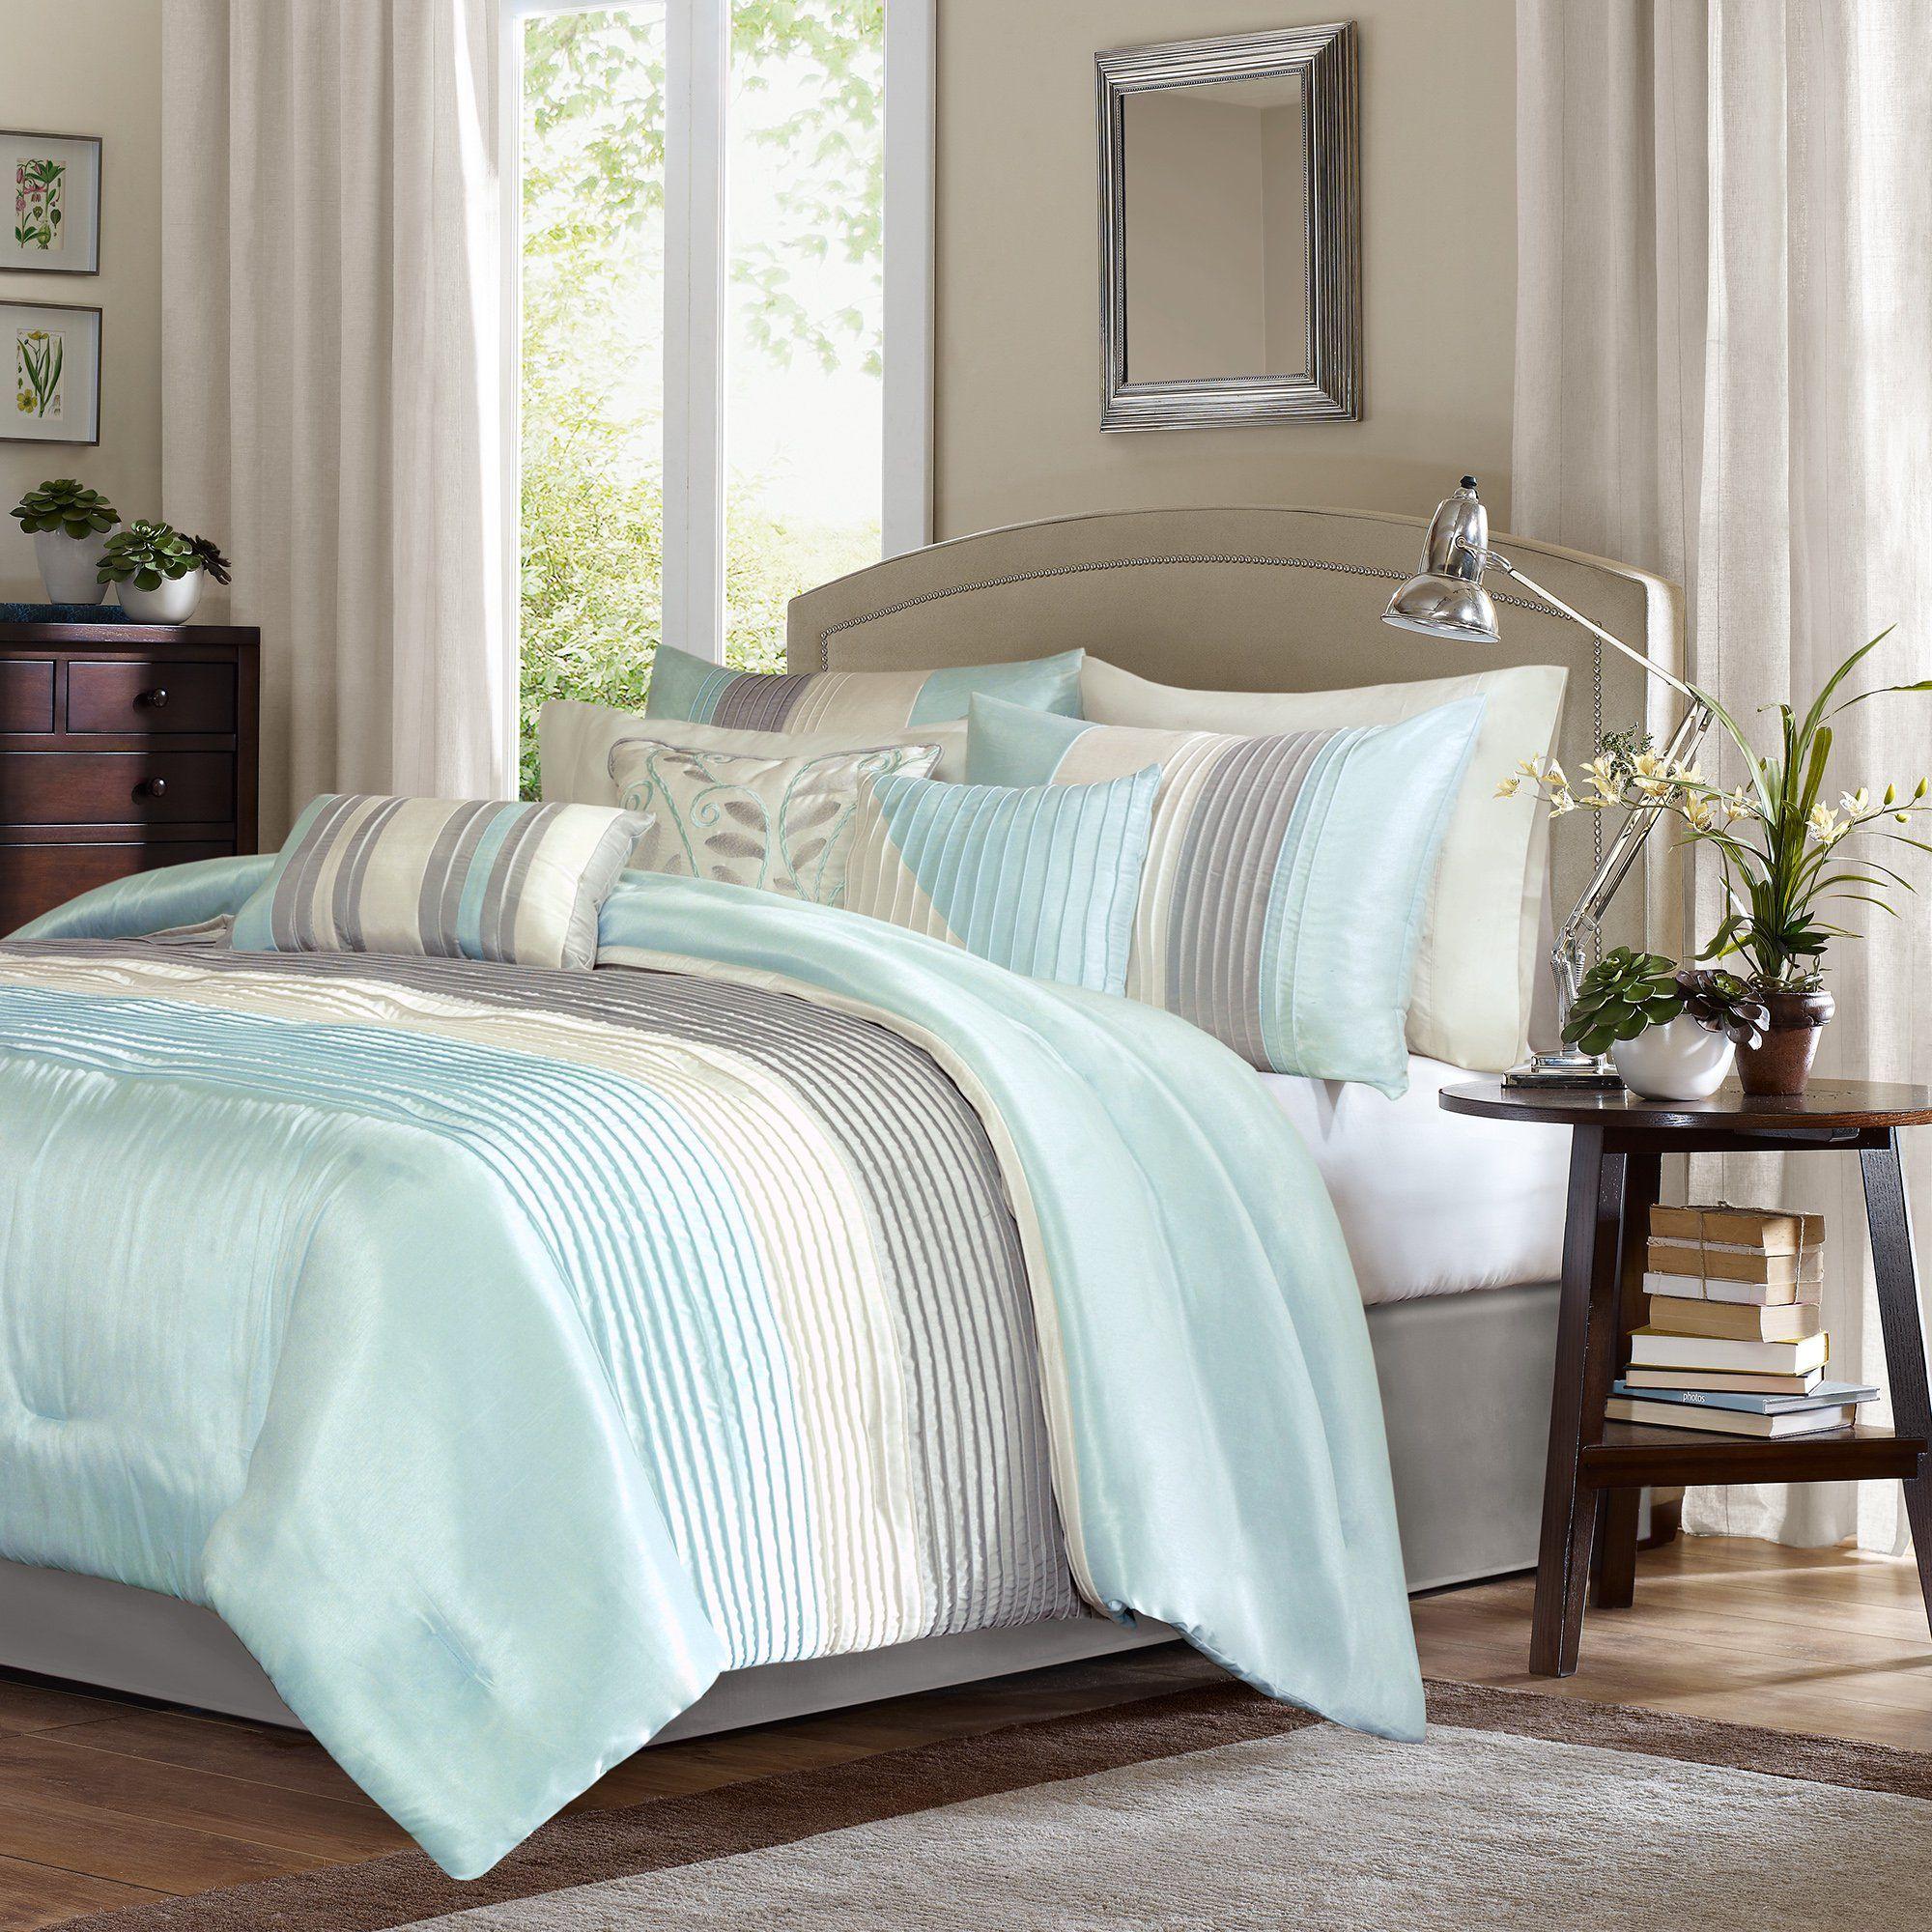 Home Essence Salem 7 Piece Comforter Set Queen Aqua Walmart Com In 2021 Comforter Sets King Comforter Sets Home What is the size of a king size comforter